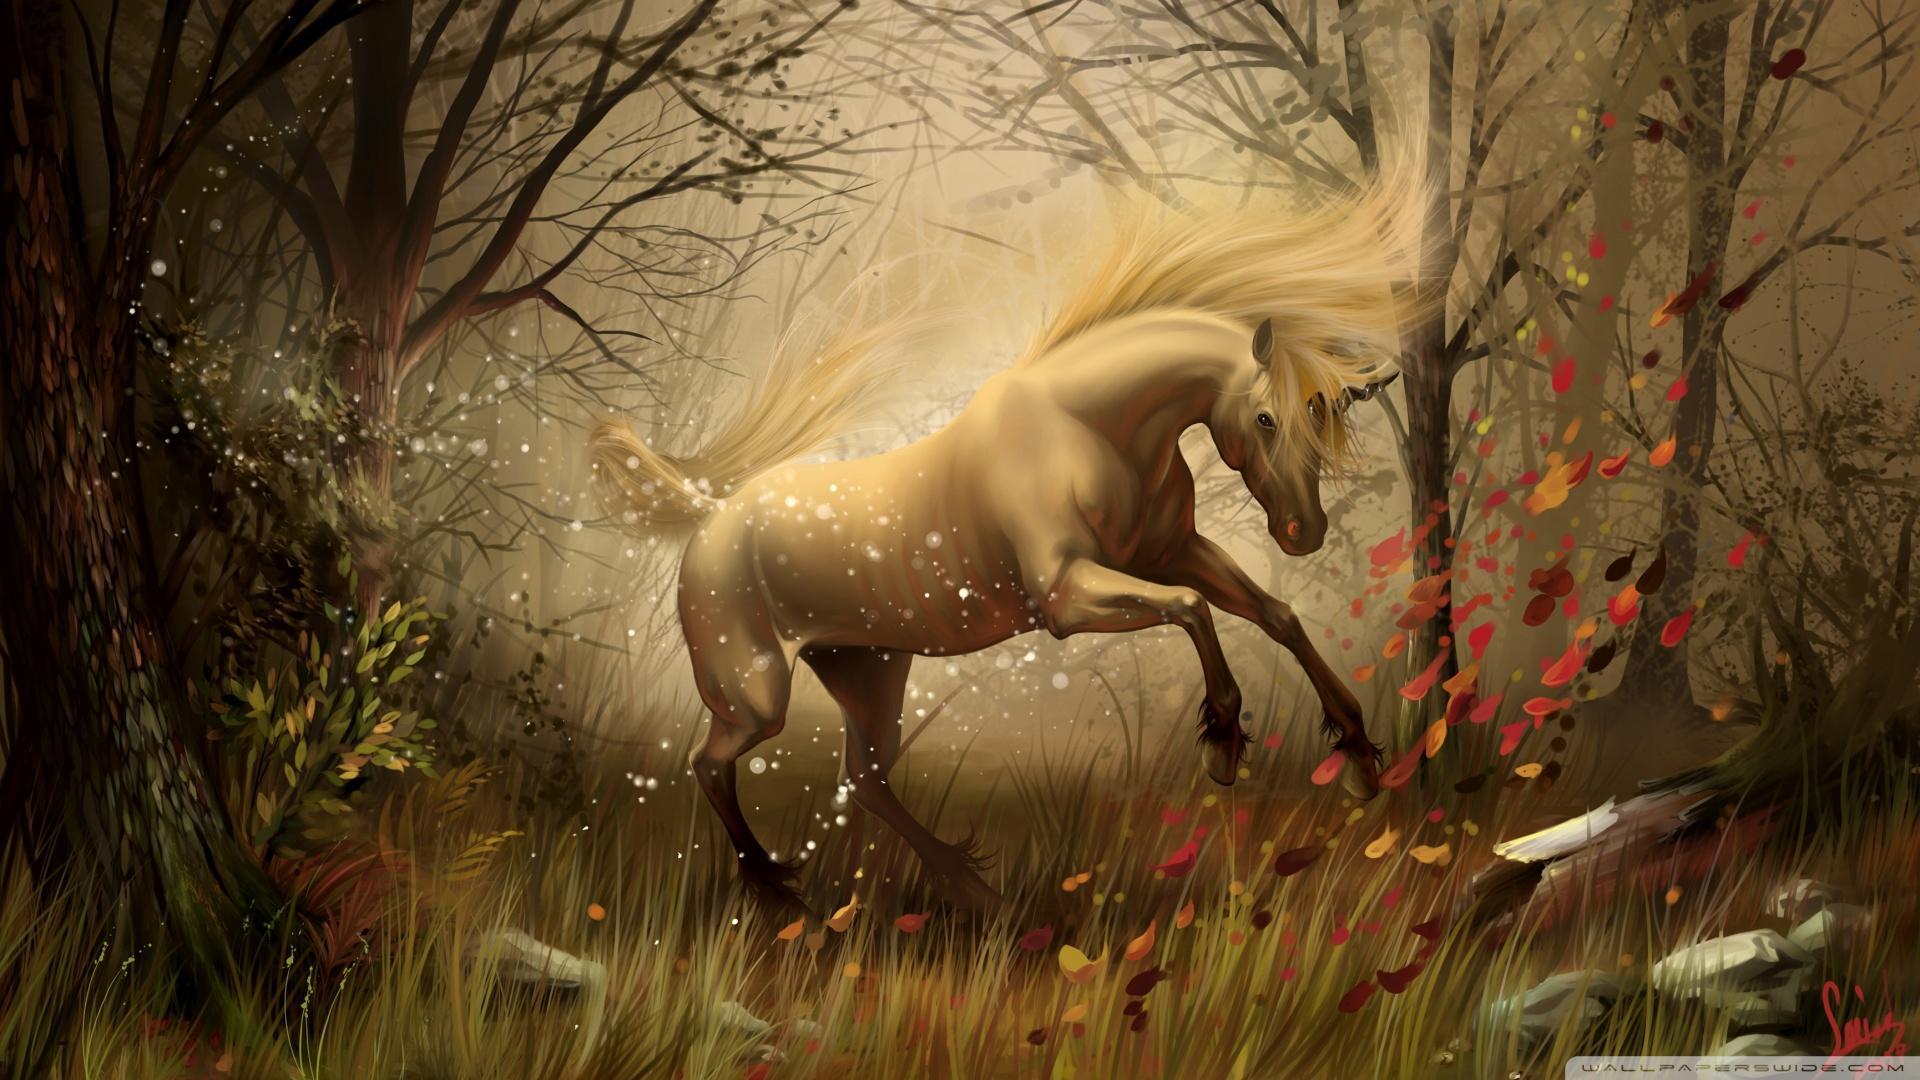 Mystical Unicorn Wallpapers - Top Free Mystical Unicorn Backgrounds